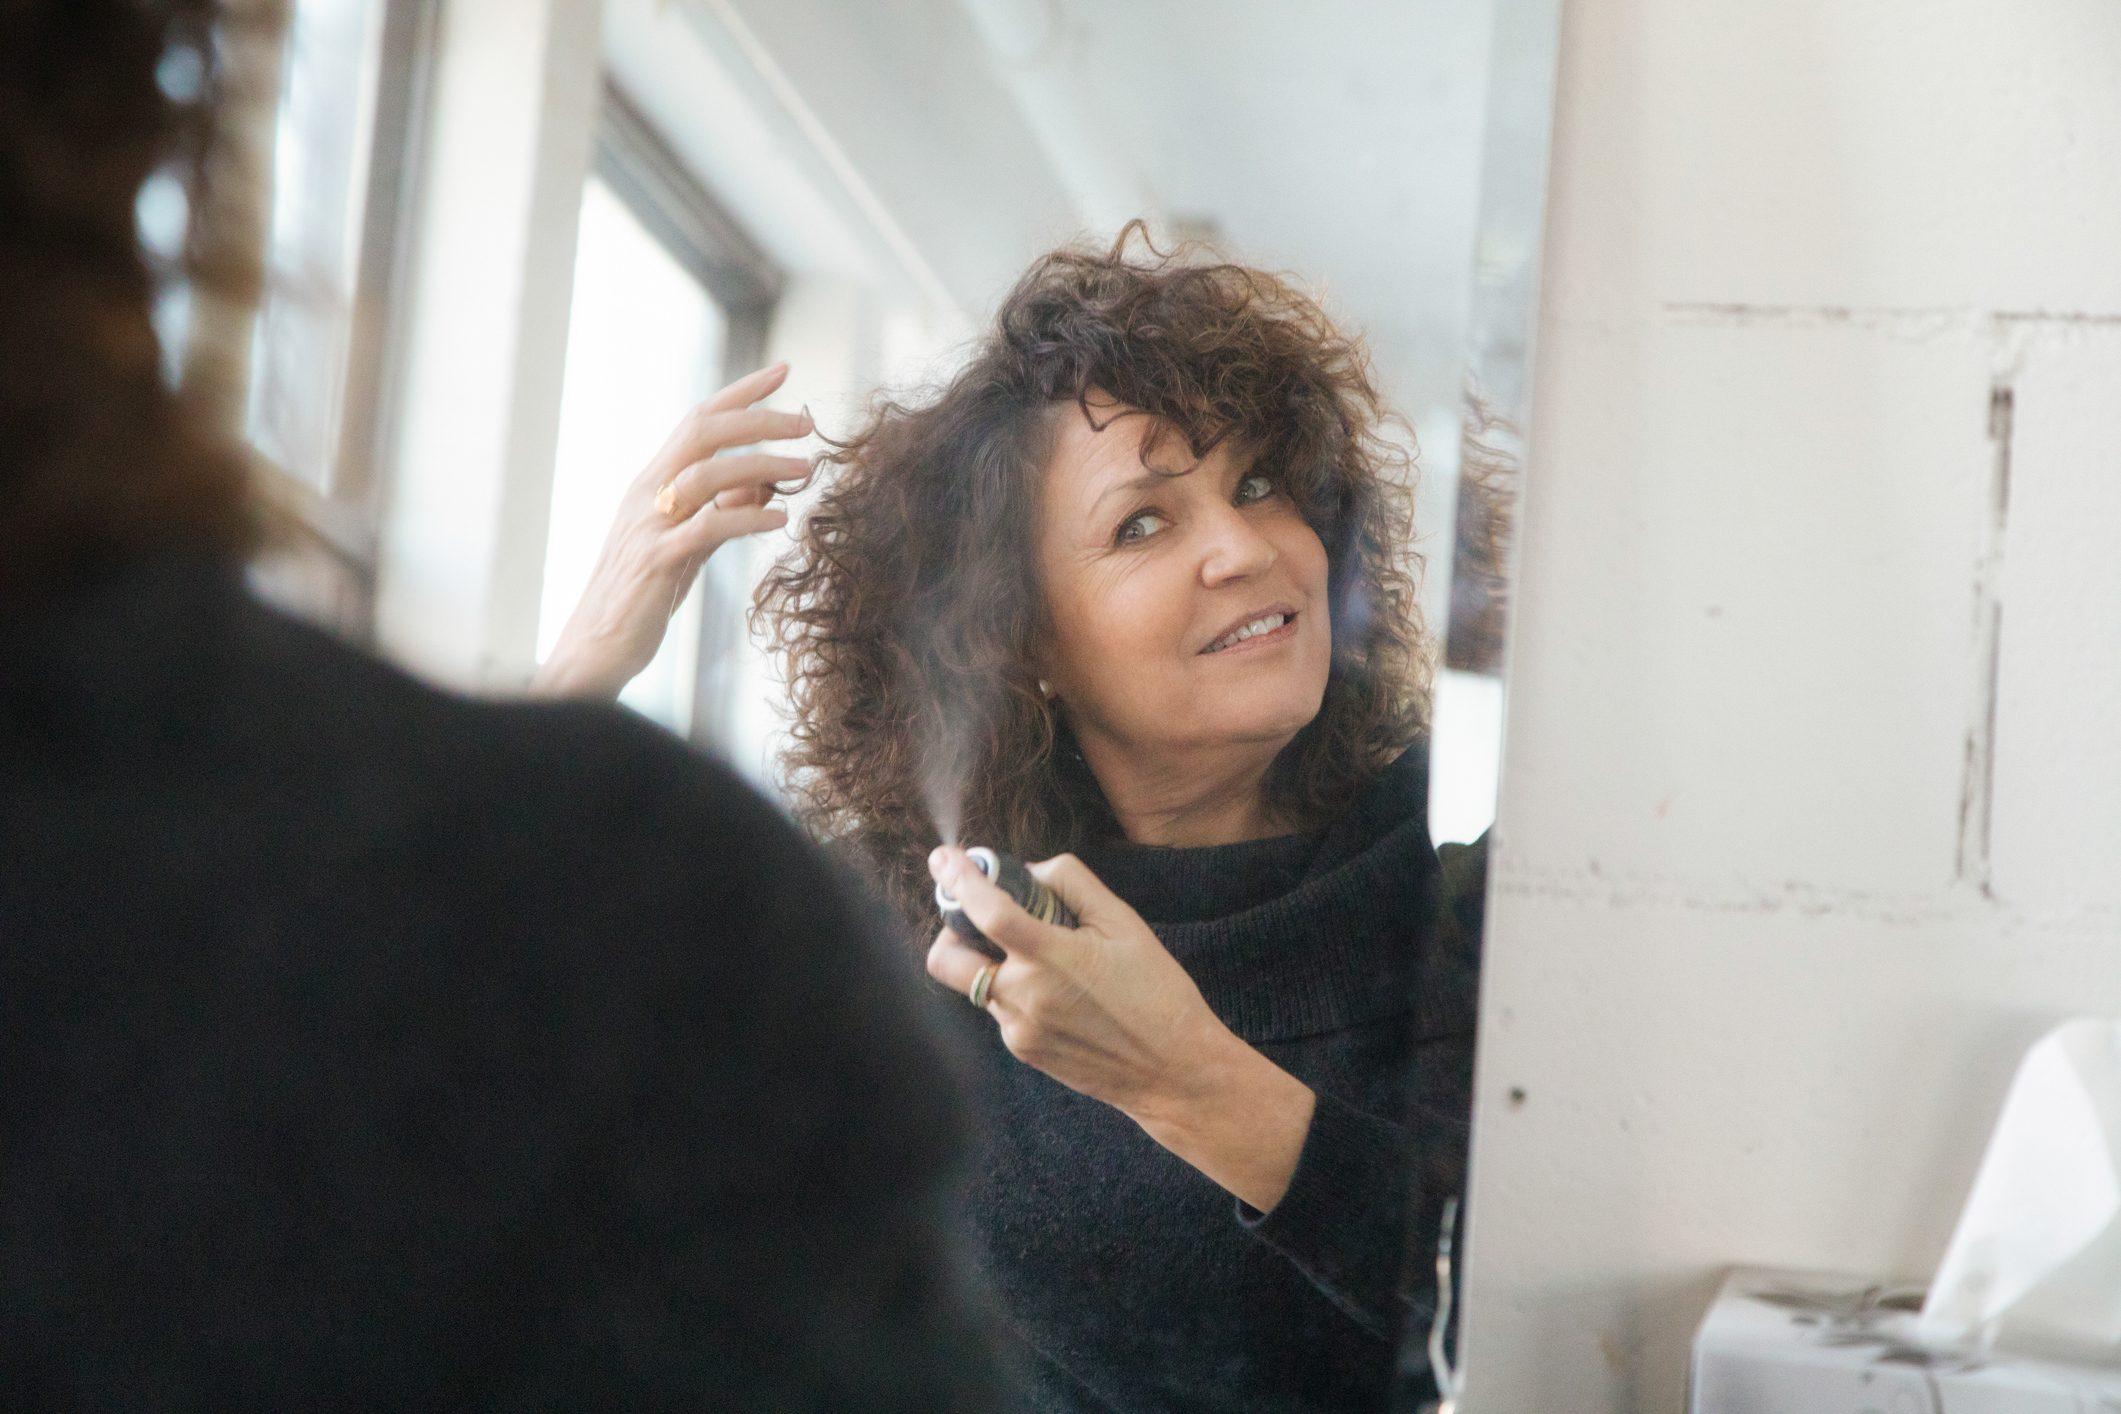 woman spraying hairspray into her hair